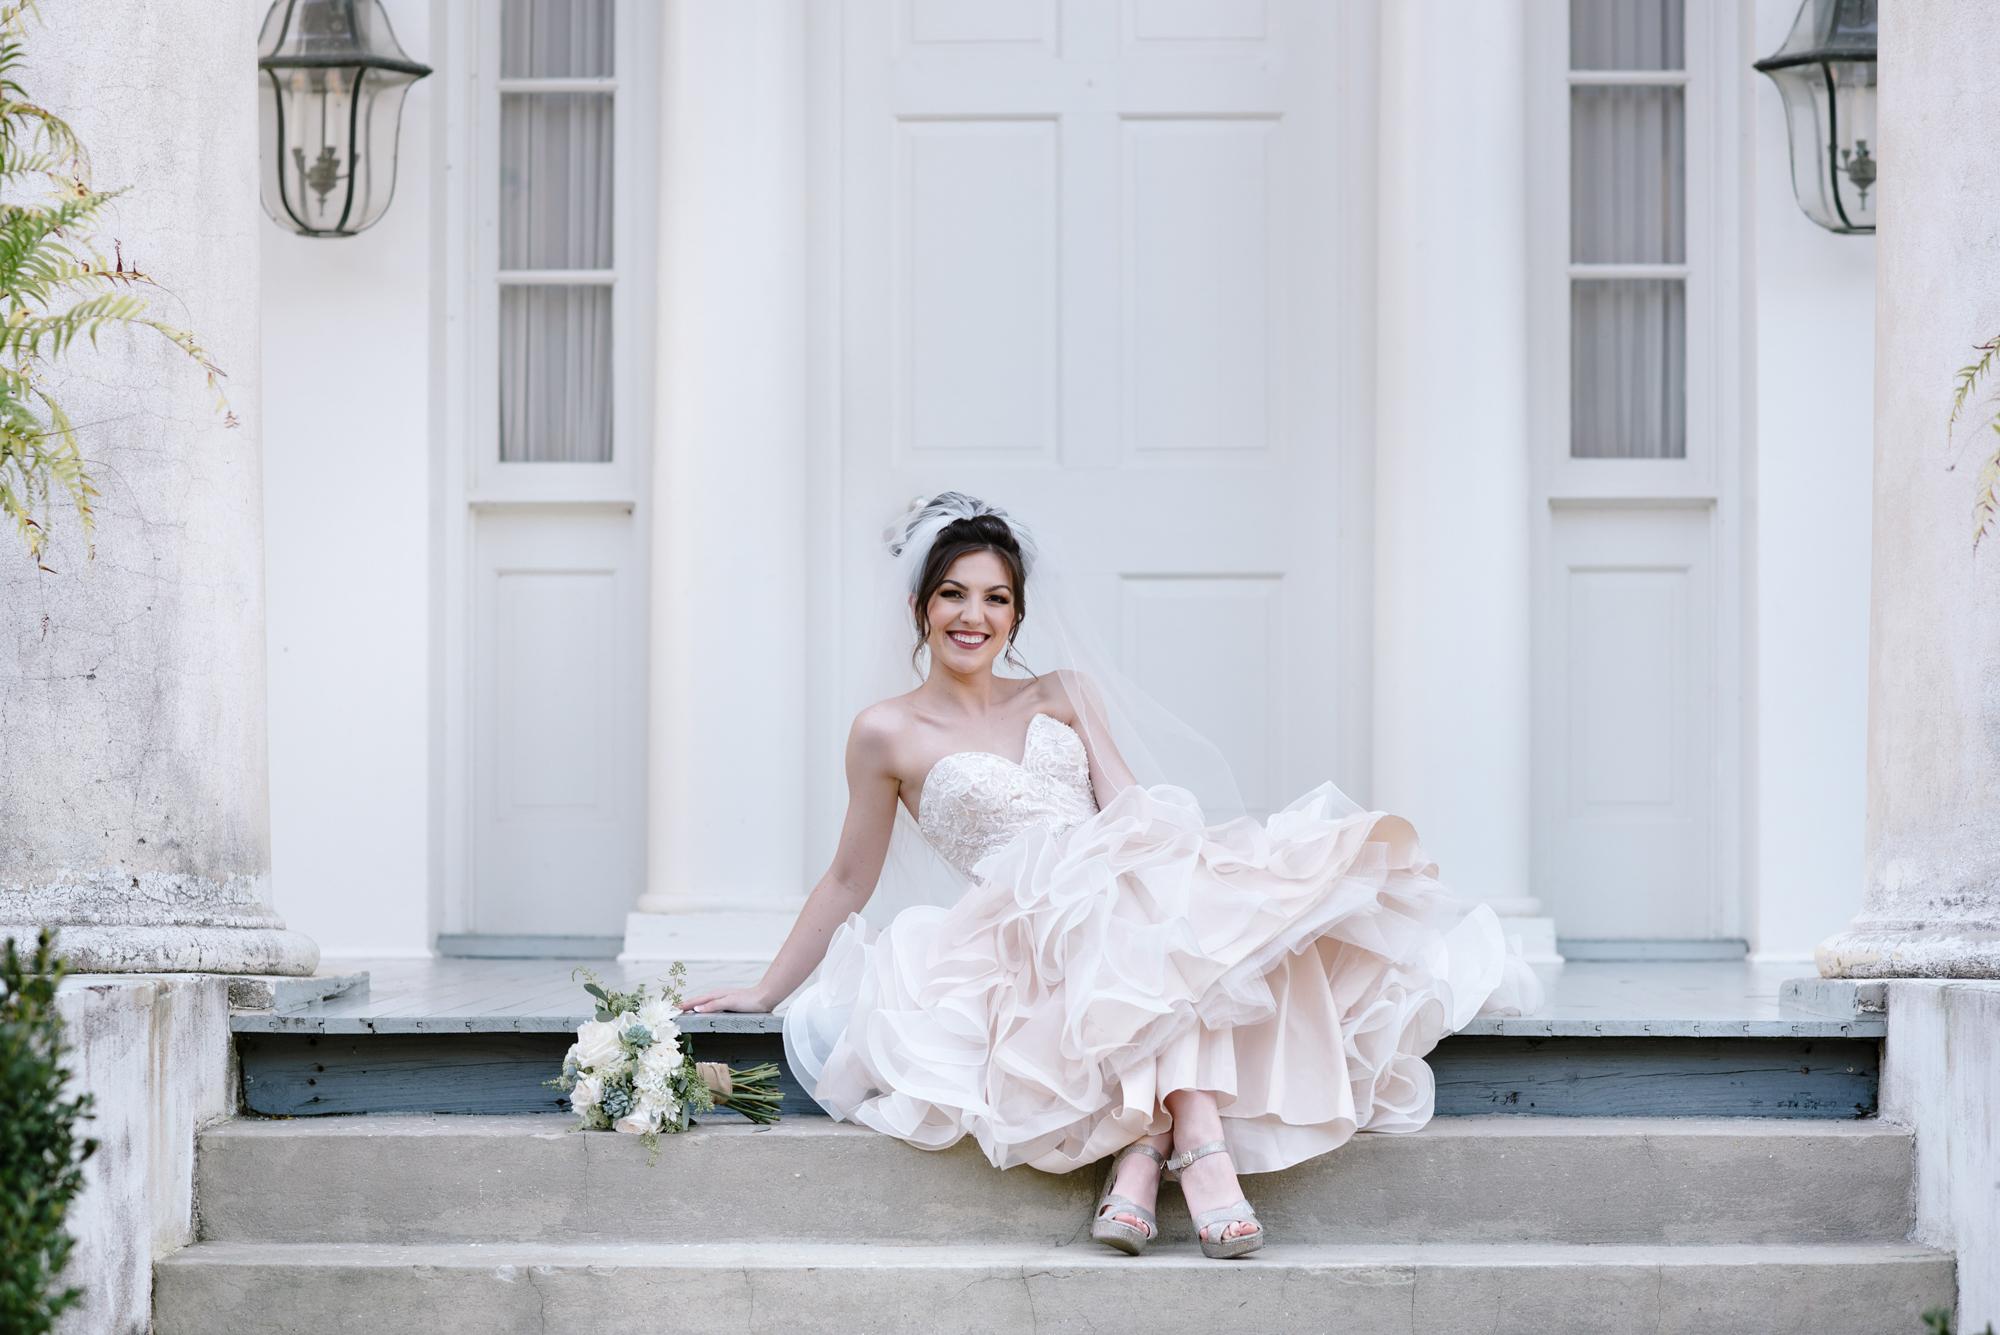 baton-rouge-wedding-photographer-7343.jpg